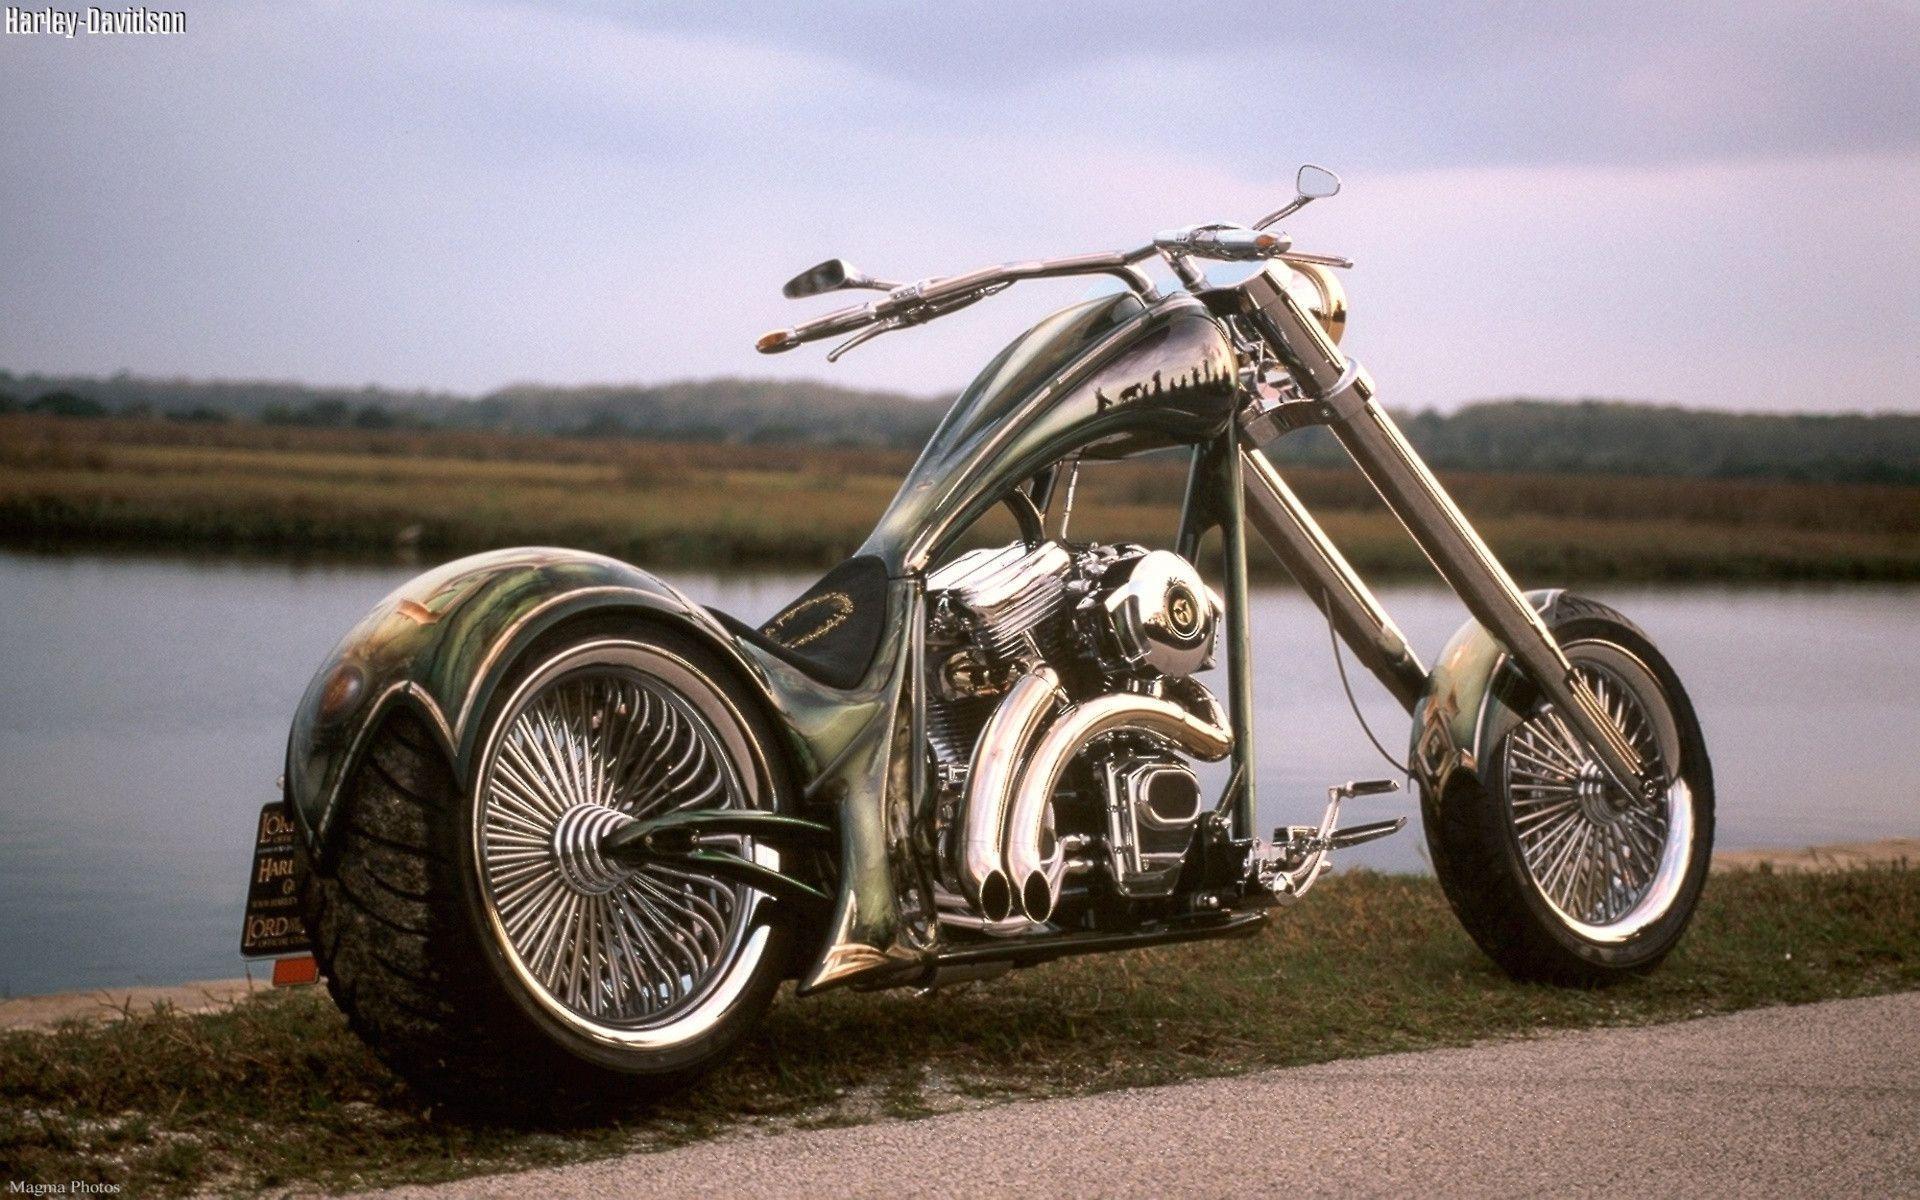 Imagenes De Motos Harley: Harley Davidson Motorcycles Wallpapers